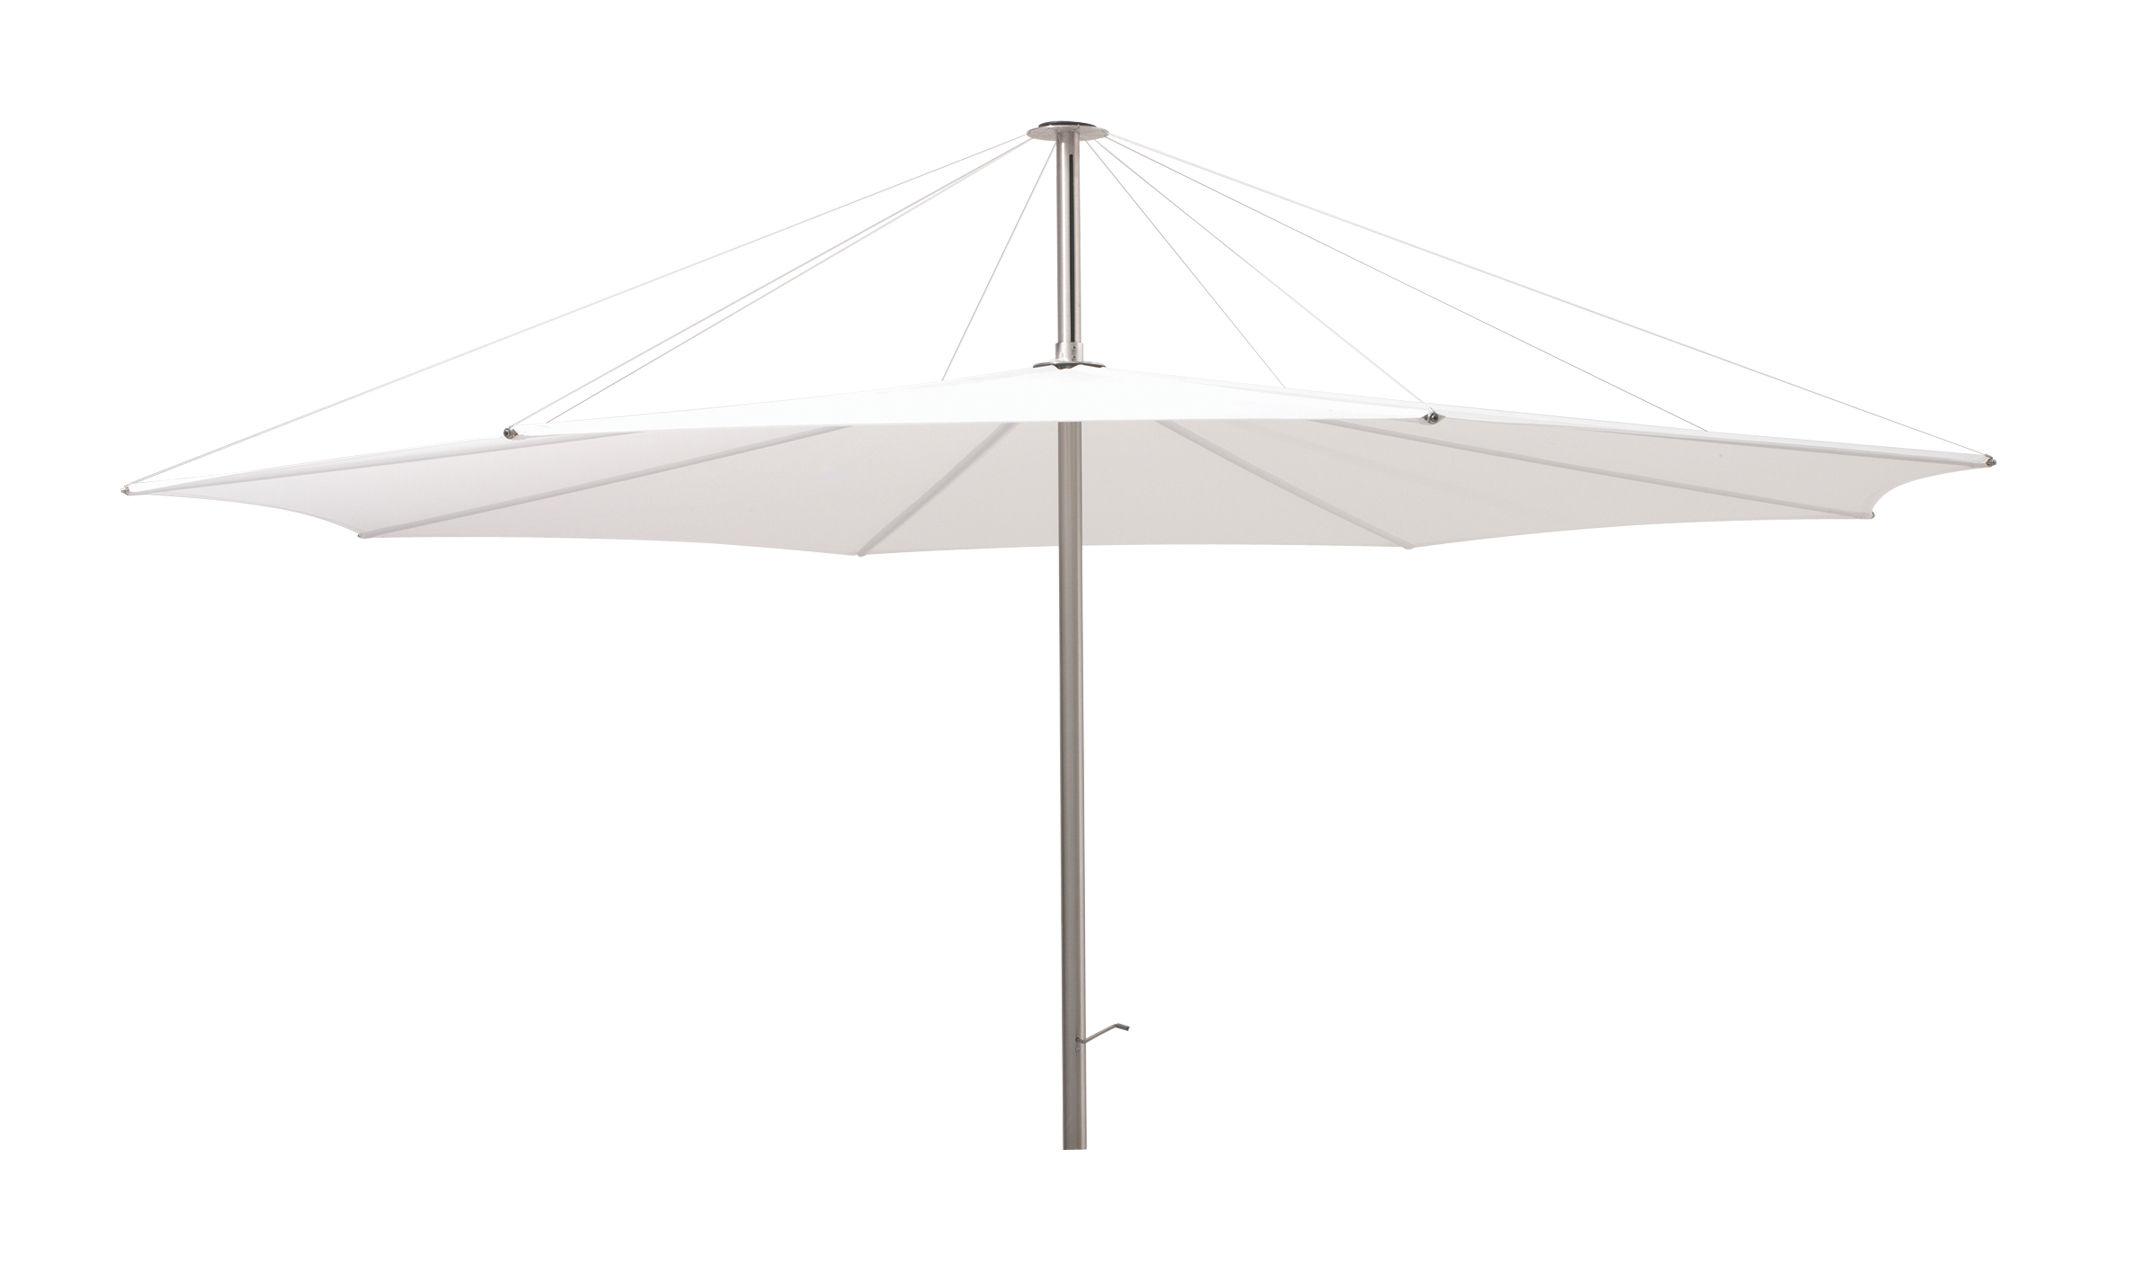 Outdoor - Parasols - Parasol Inumbra Ø 350 cm - Extremis - Parasol blanc - Acier inoxydable, Toile de polyester